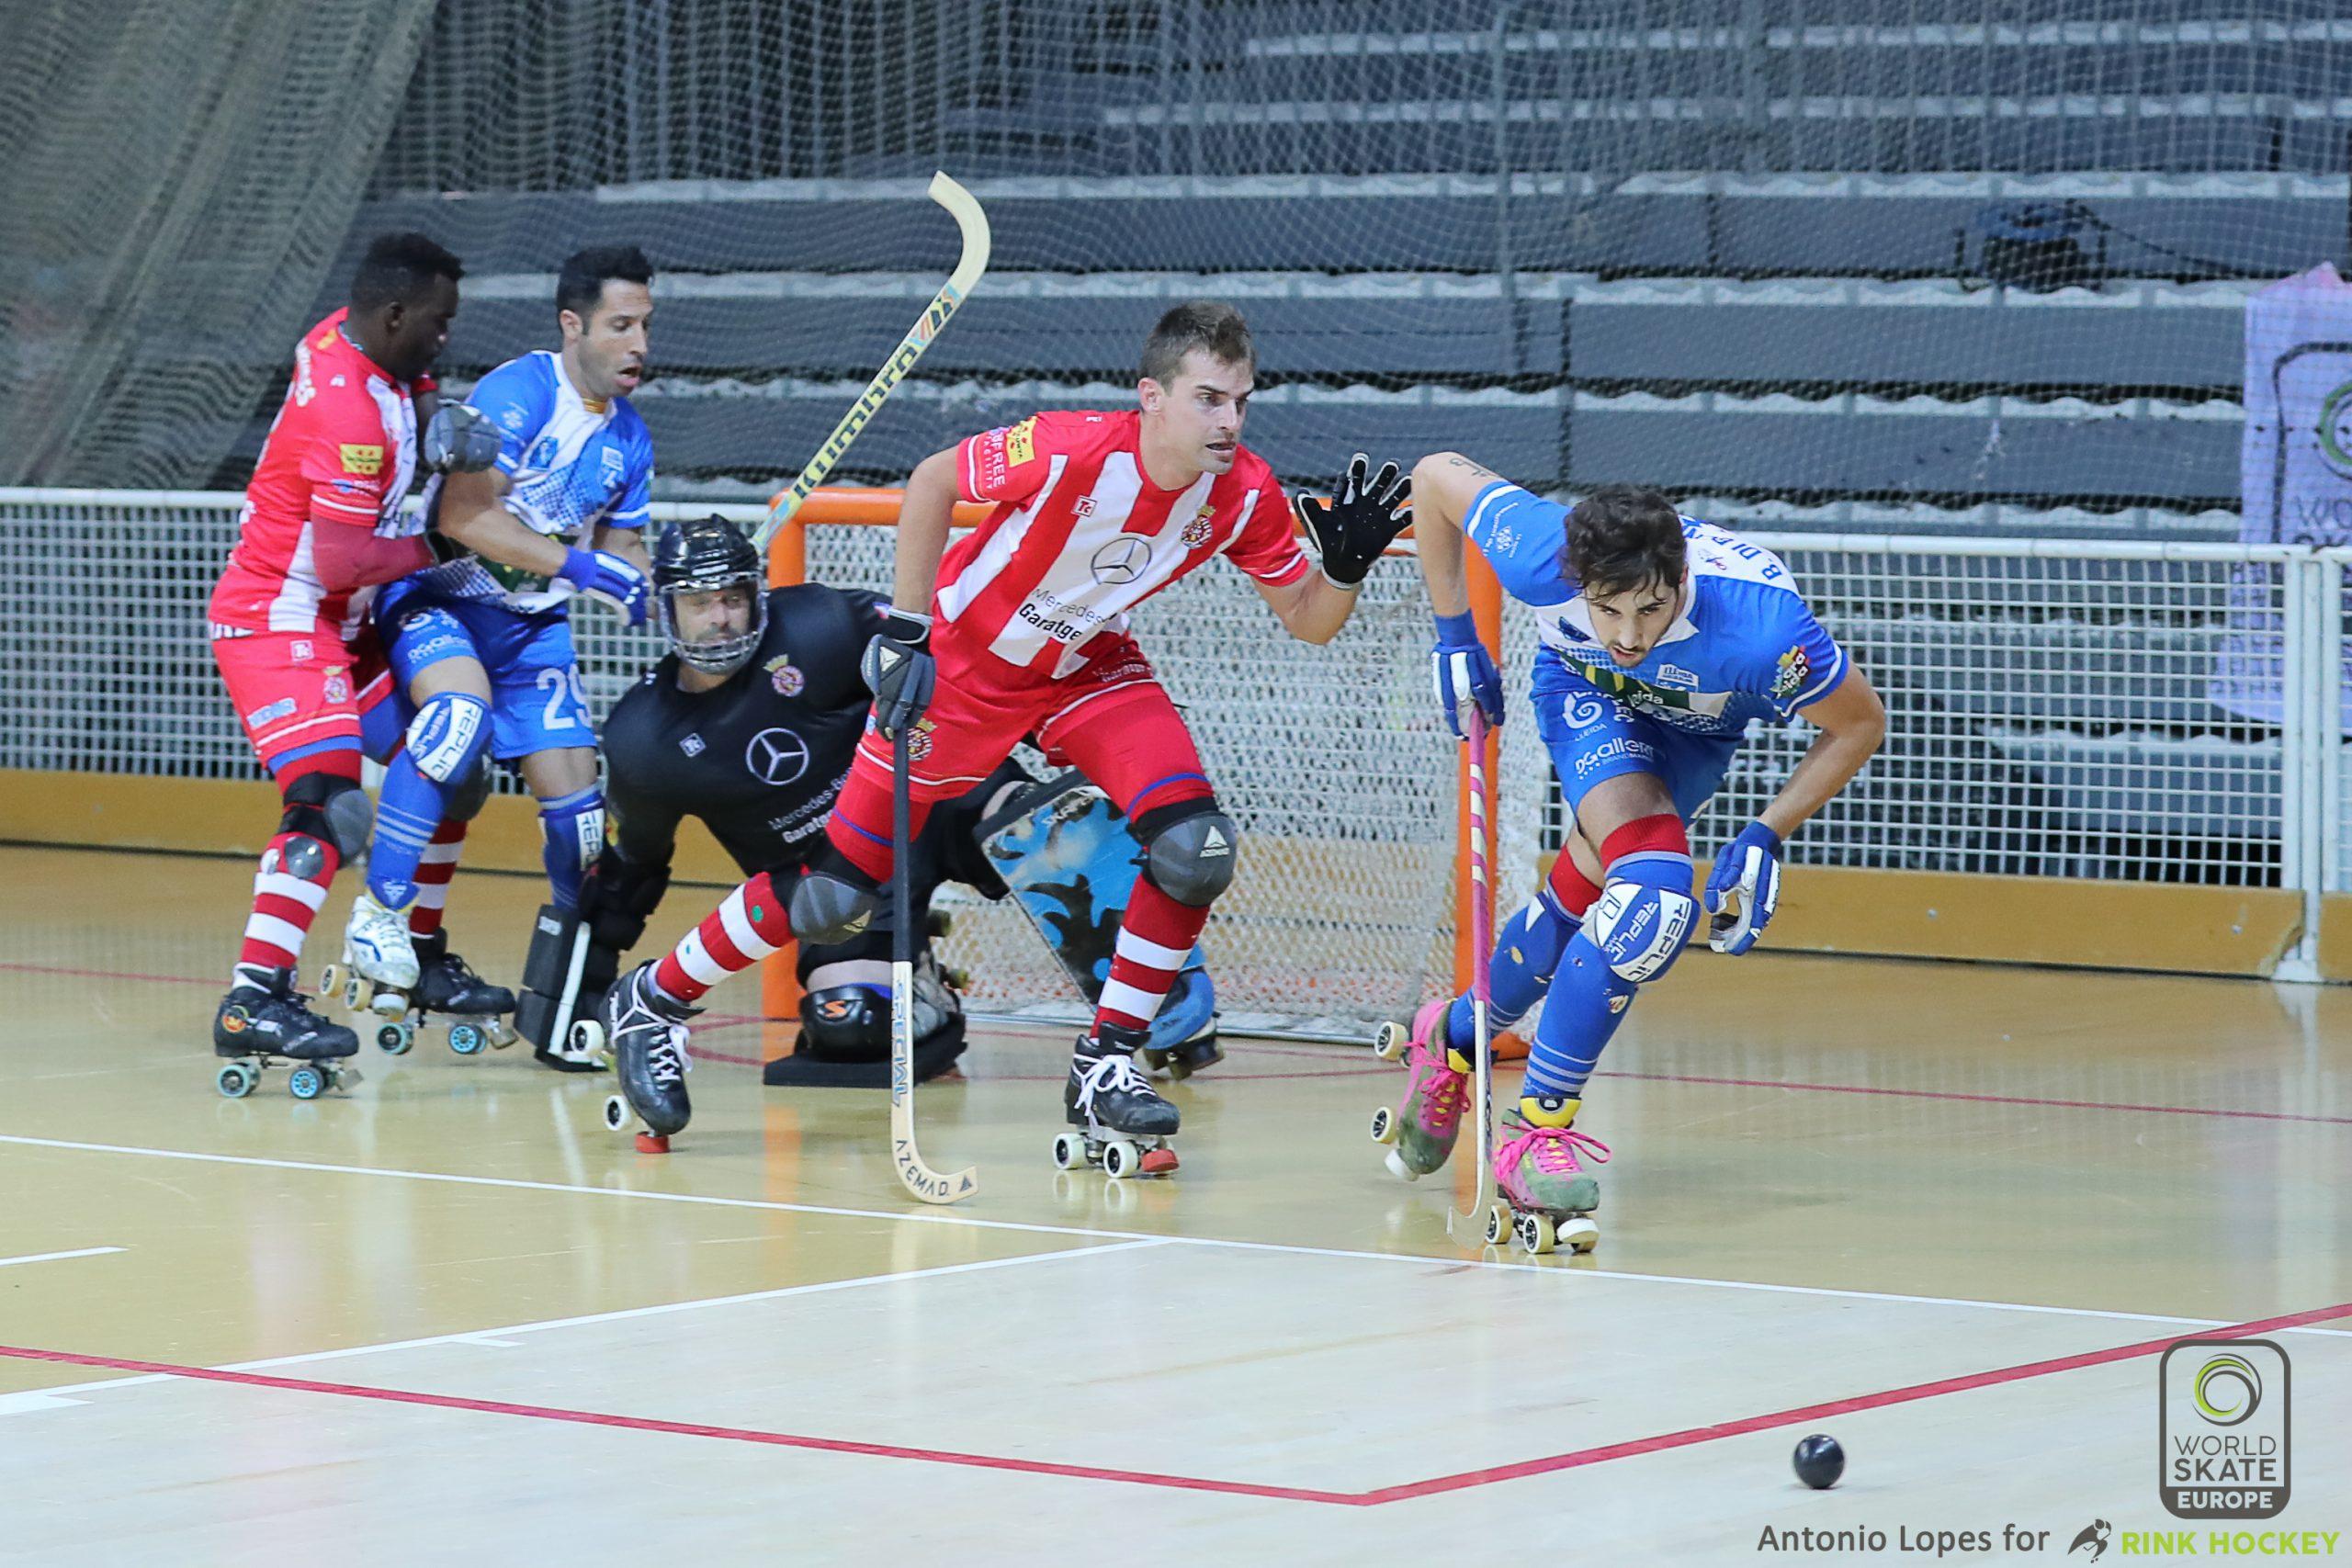 PHOTOS - 19-06-2021 - WS EUROPE CUP - Match #023 - CE Lleida Llista (SP) x Girona CH (SP)